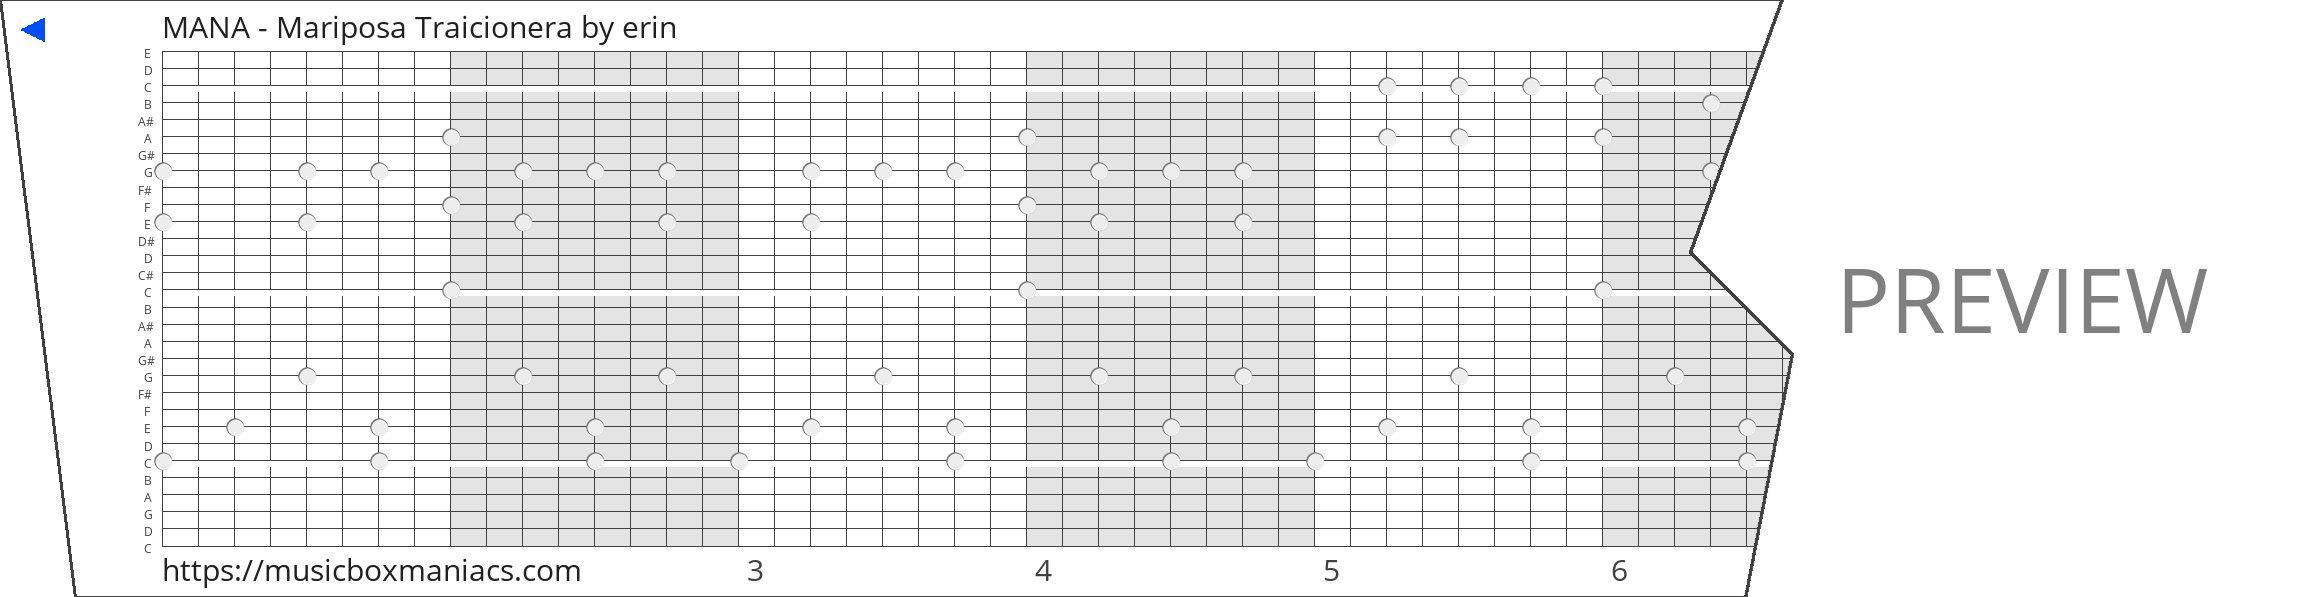 MANA - Mariposa Traicionera 30 note music box paper strip